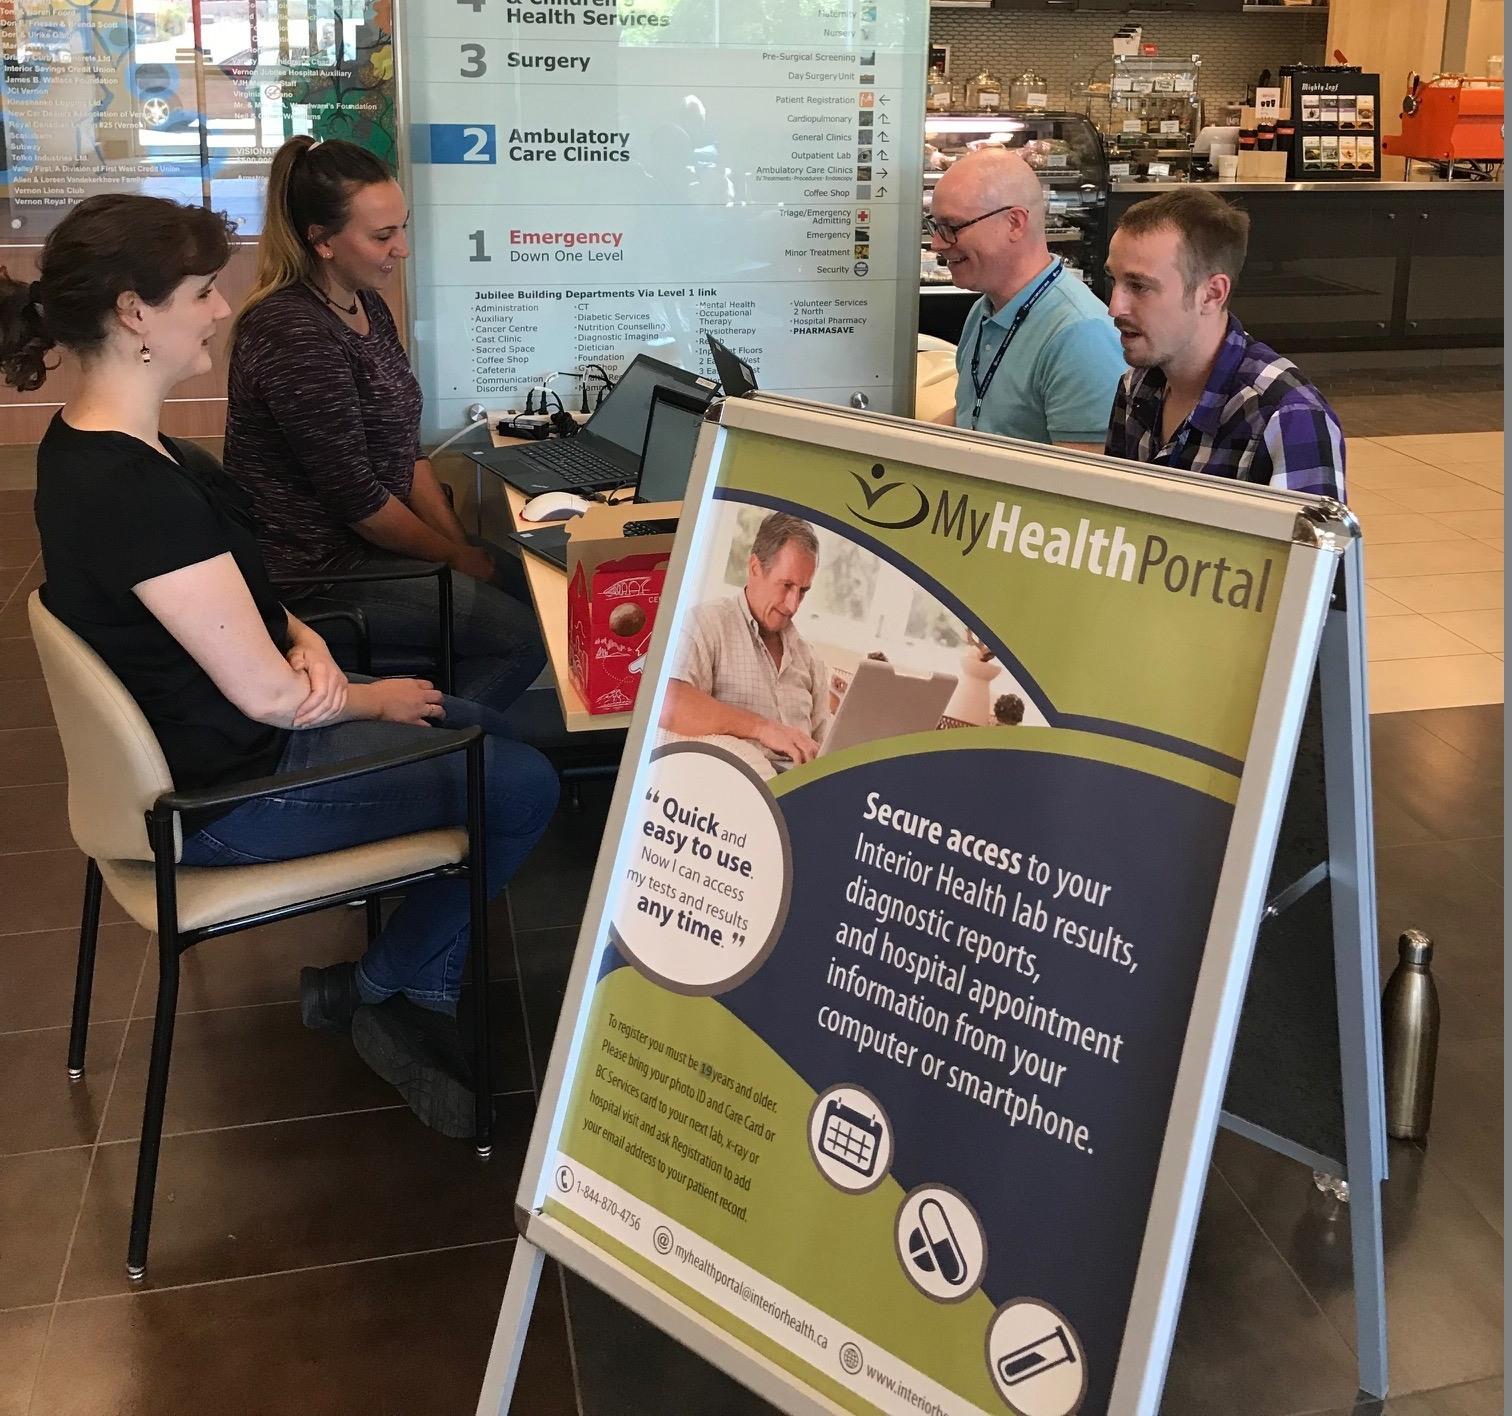 Interior Health upgrades 'MyHealthPortal' in East Kootenay